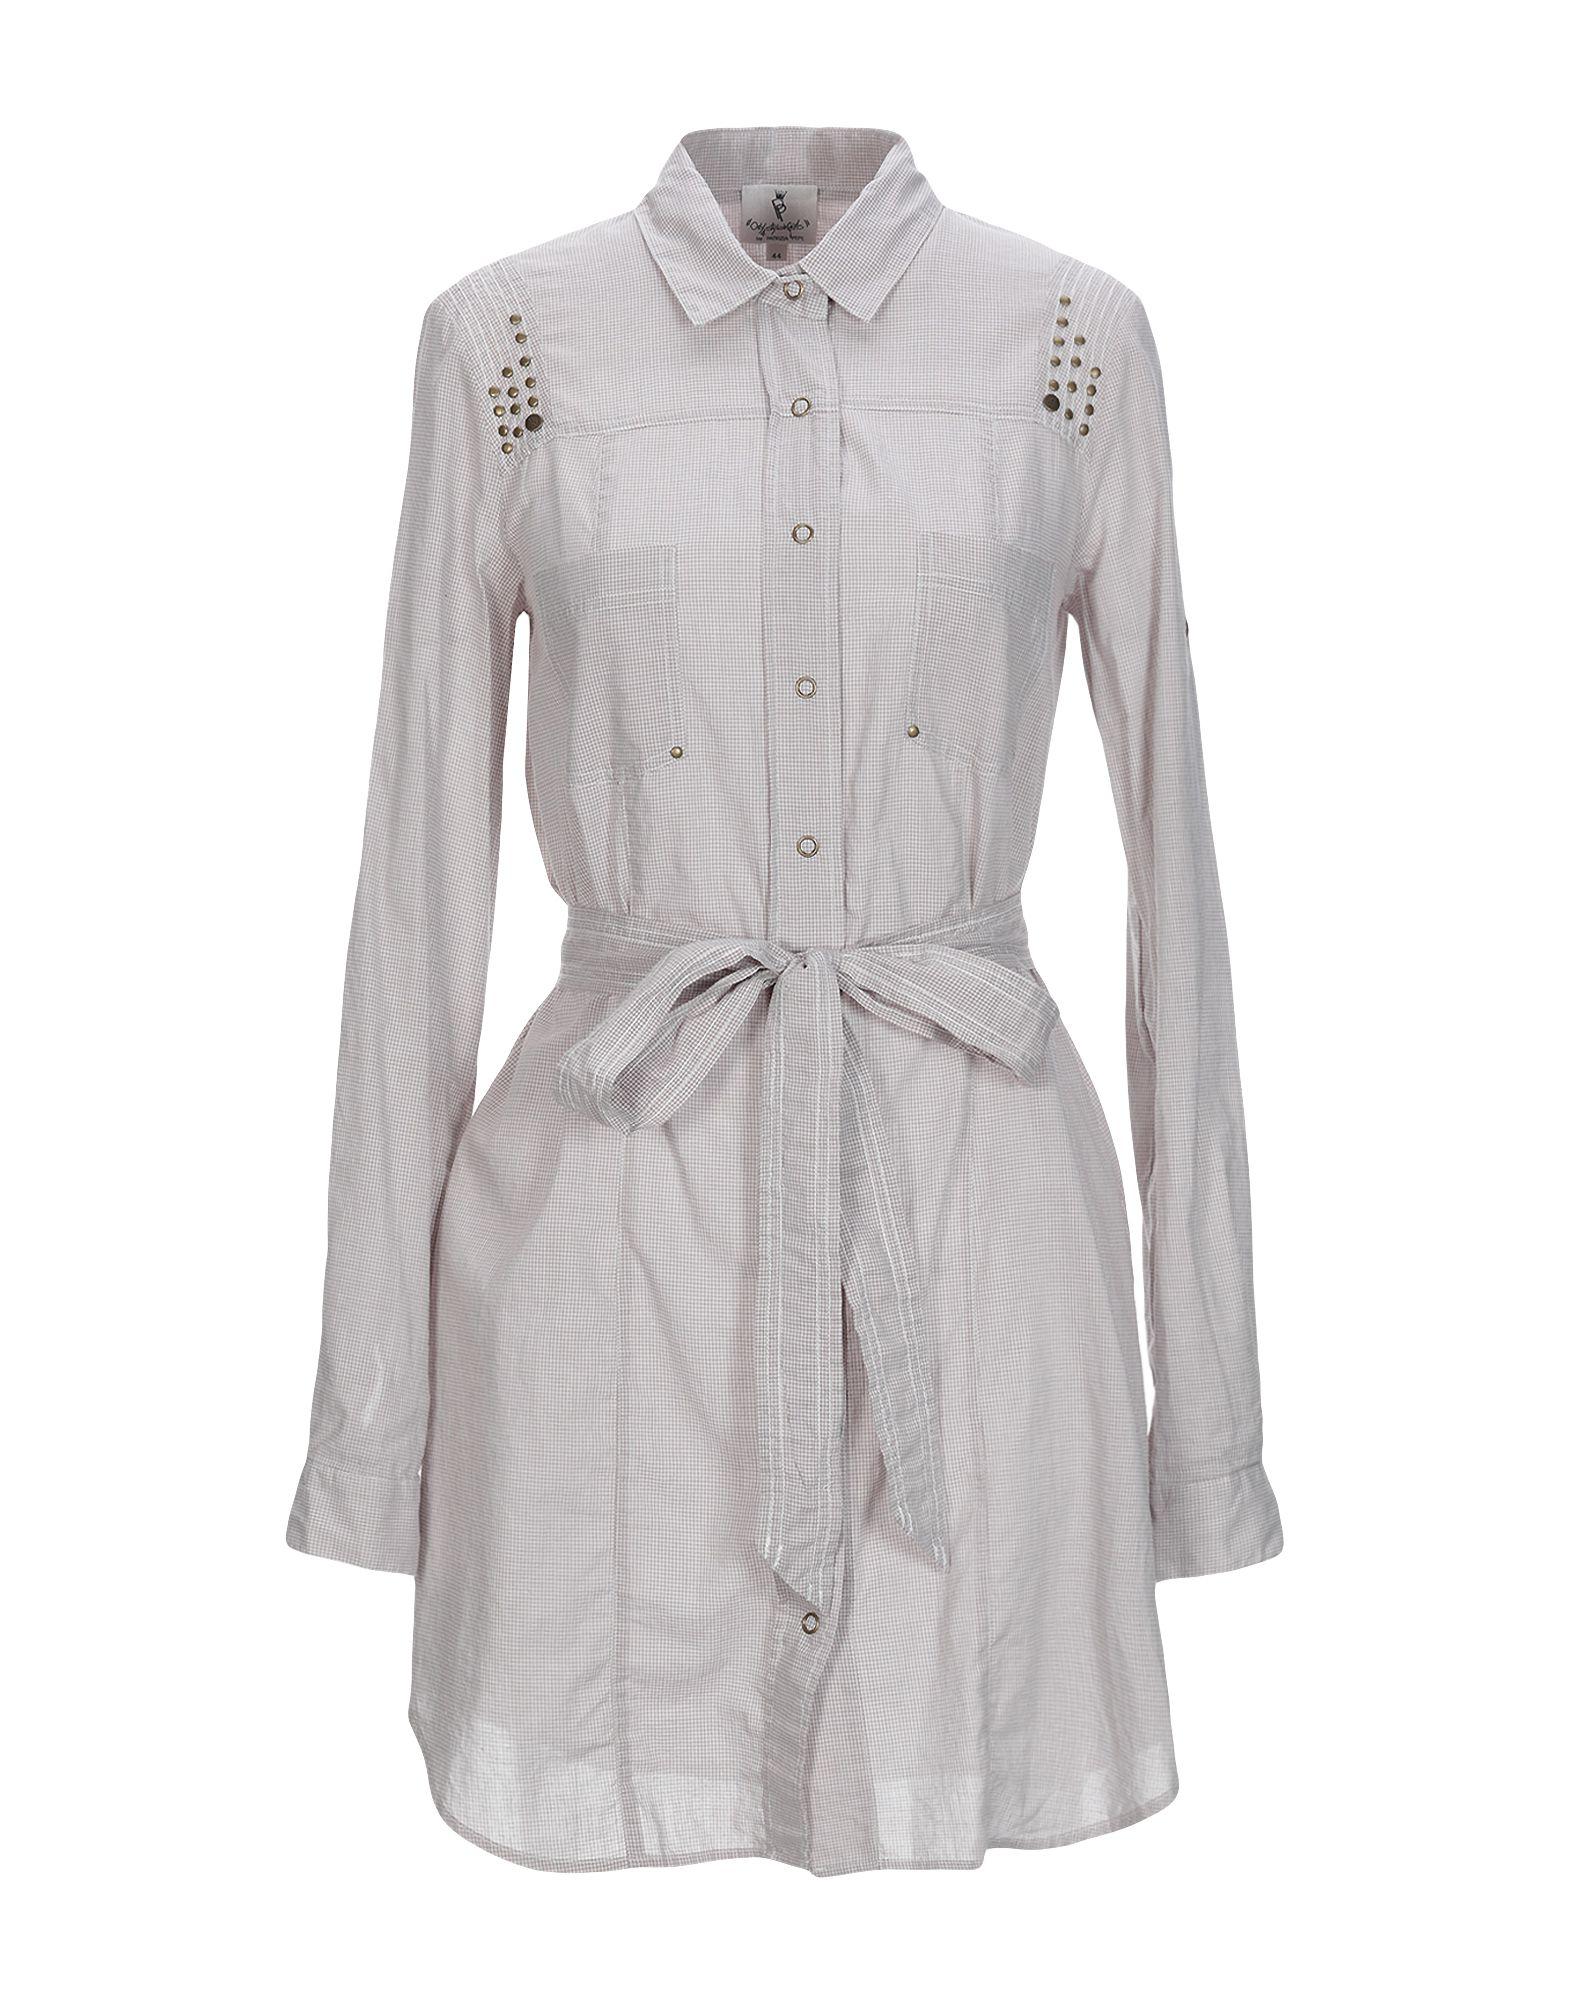 ONLY 4 STYLISH GIRLS by PATRIZIA PEPE Короткое платье платье quelle patrizia dini by heine 66450